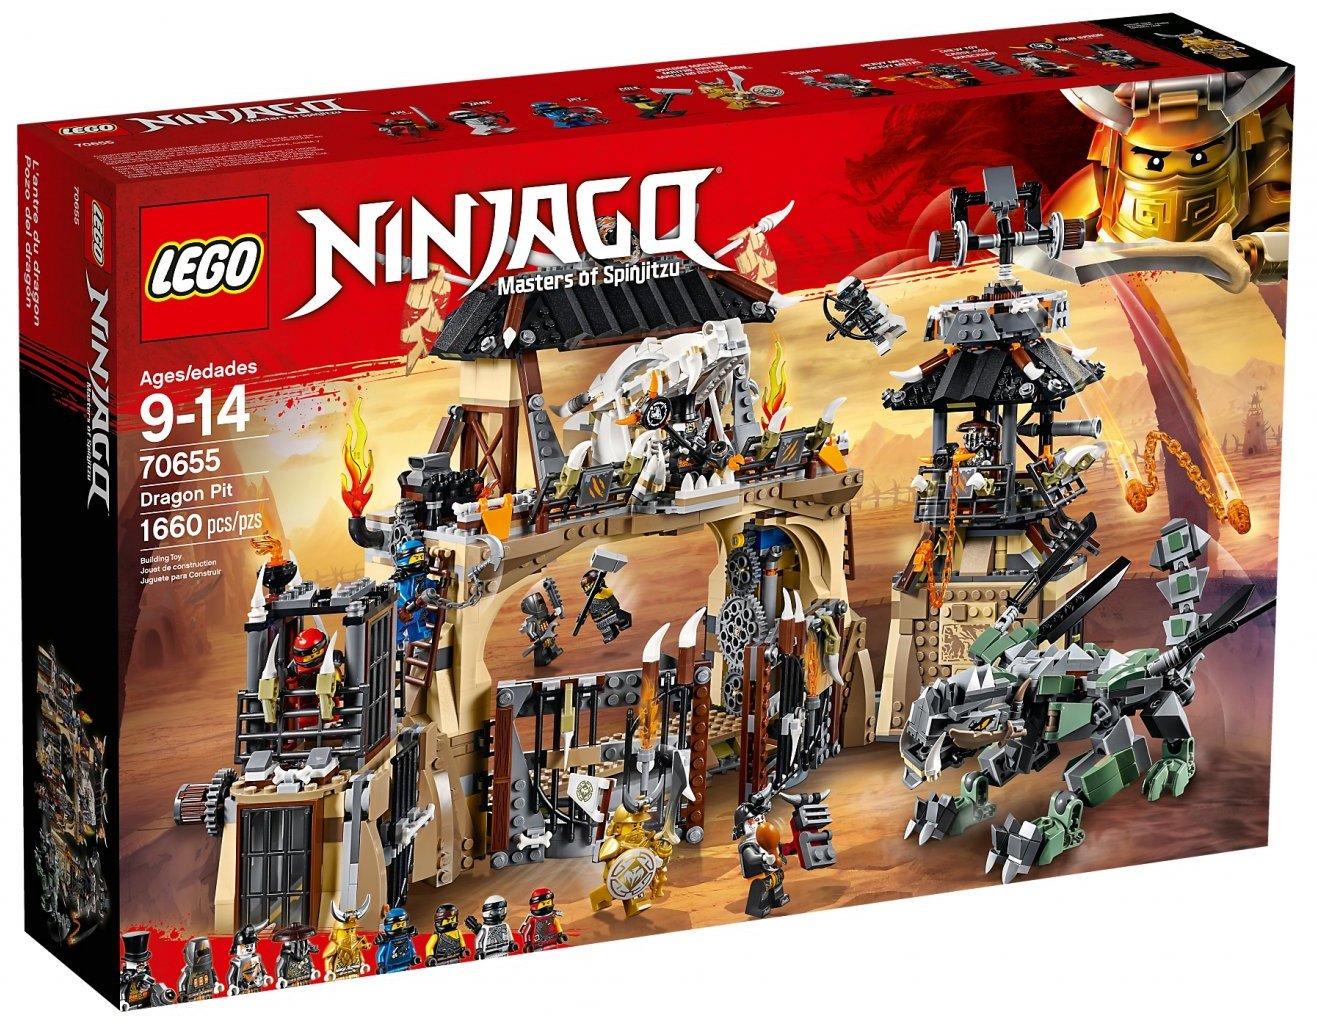 Lego Ninjago 70608 NINJA MASTER FALLS Sensui Wu Skeleton Kai Jungle Garmadon NEW